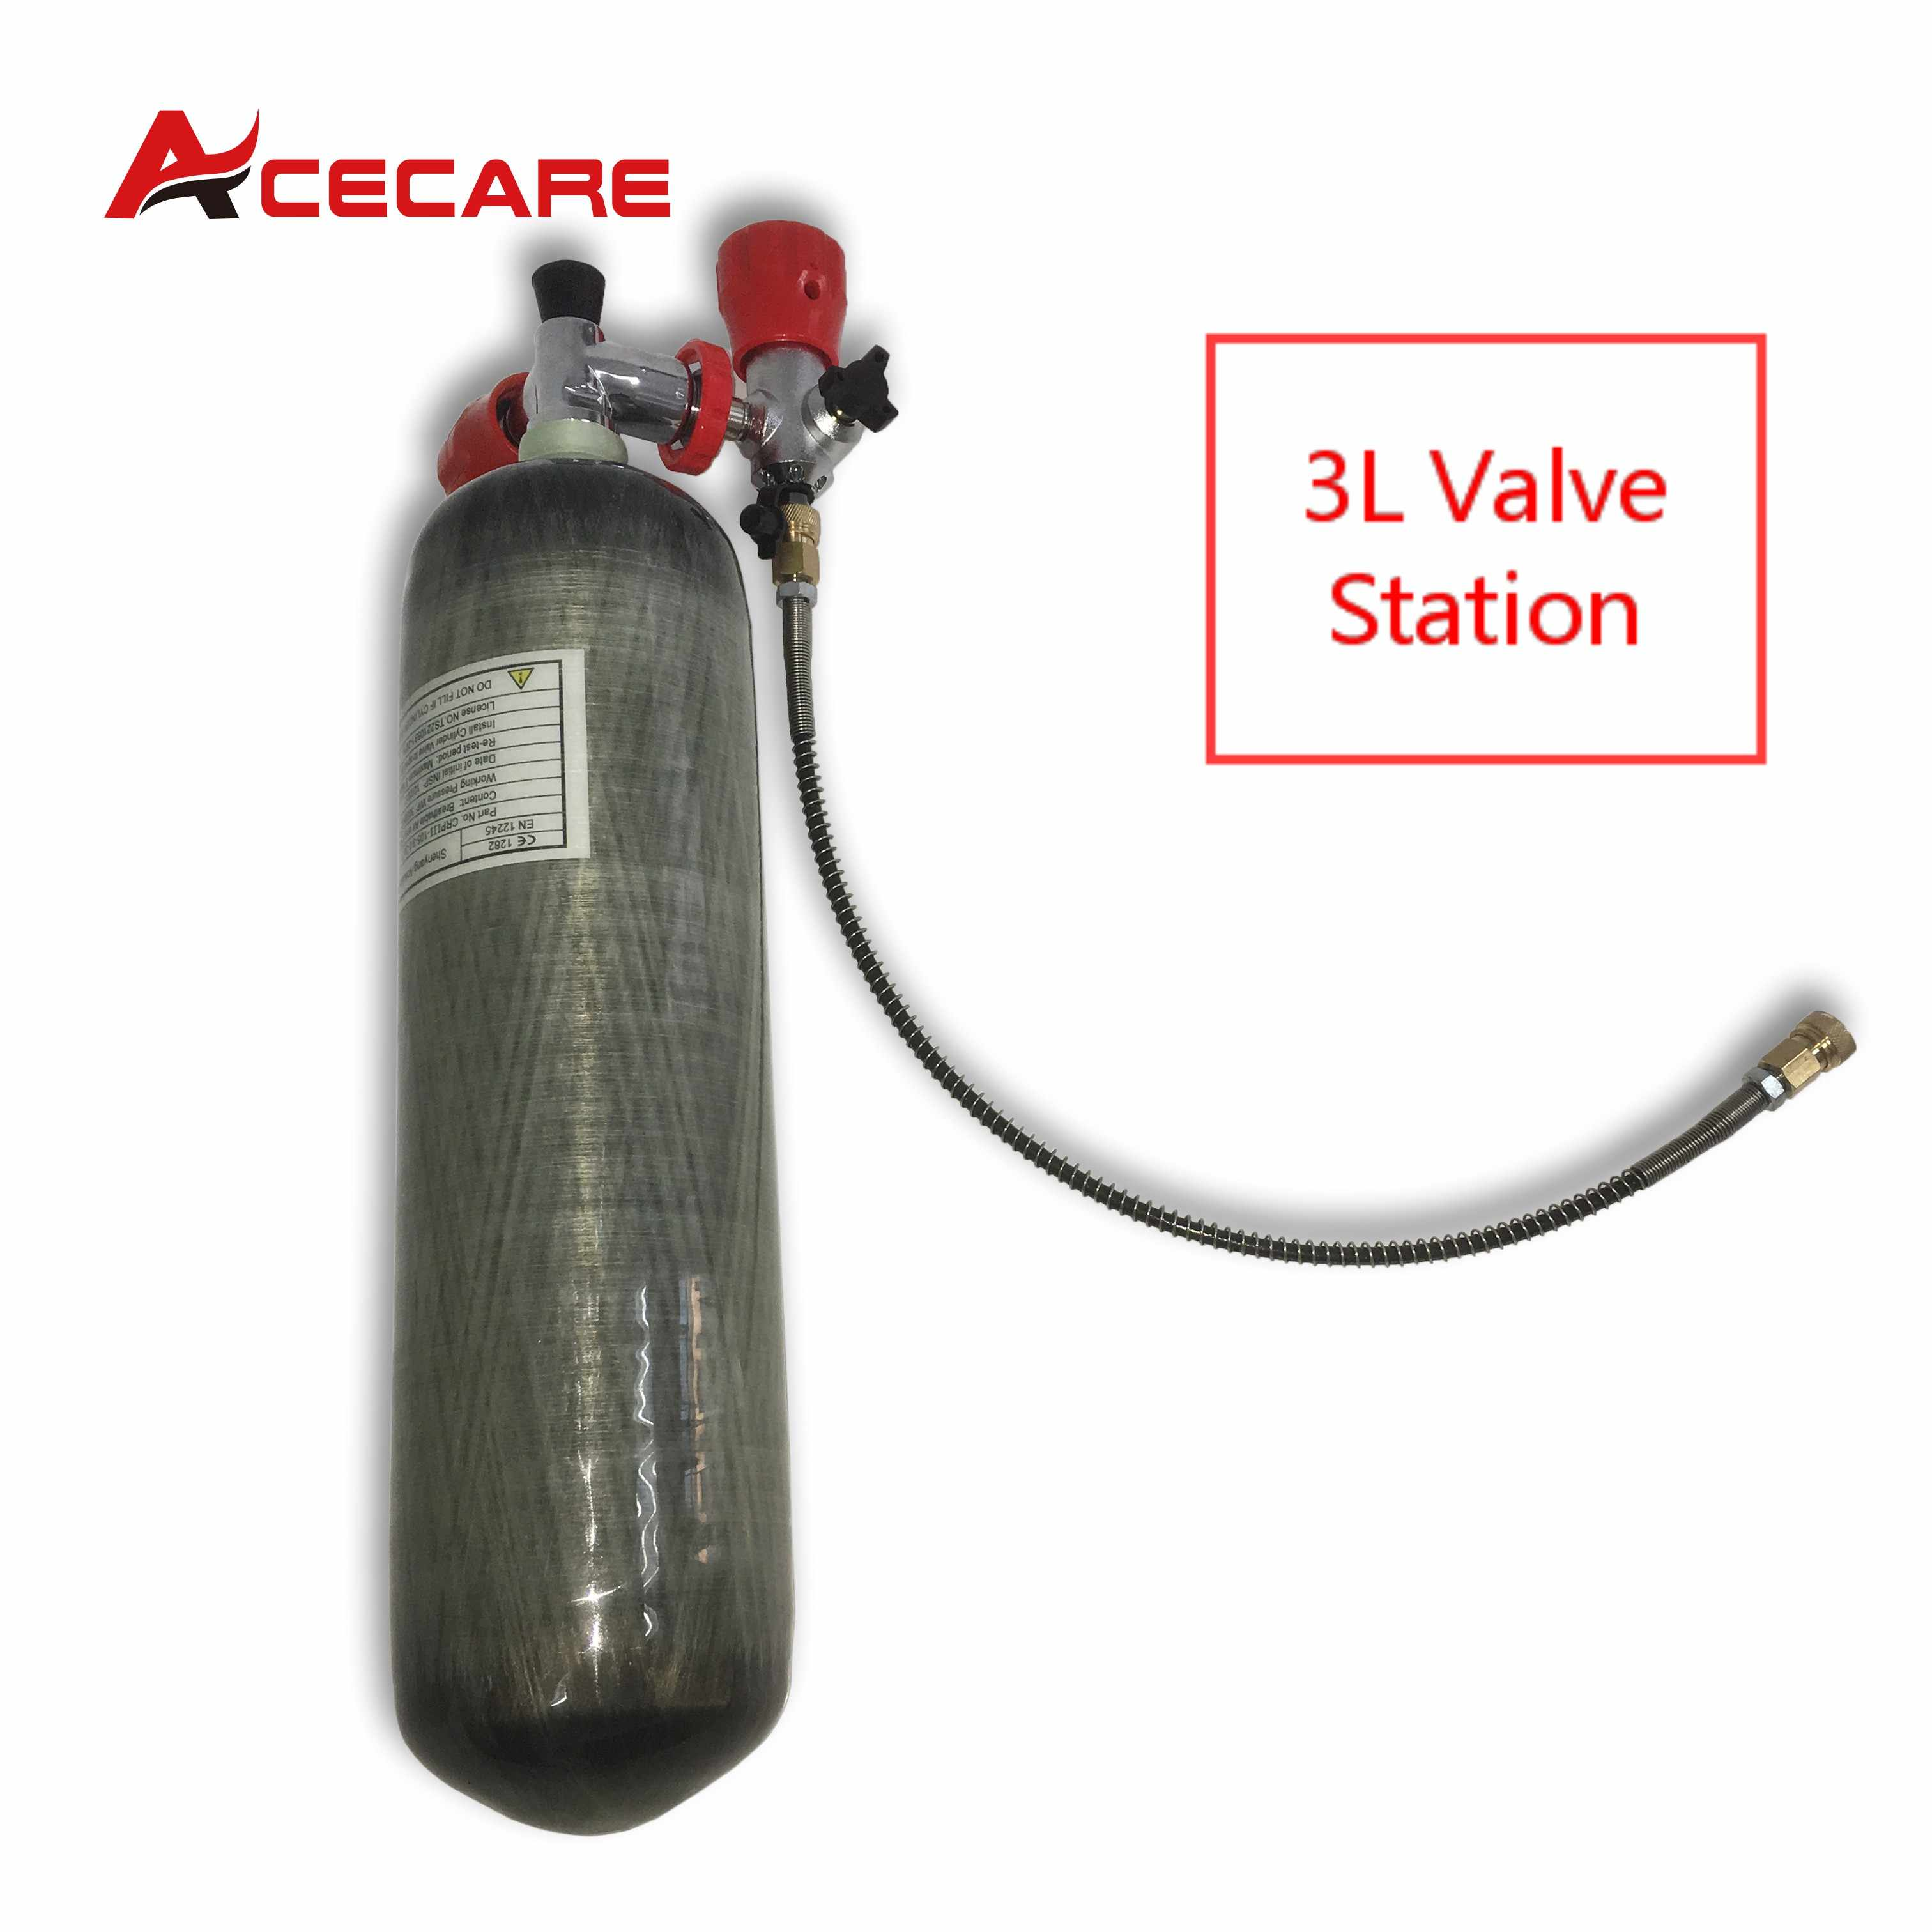 AC103101 الغوص 3L 4500Psi خزان من ألياف الكربون تحت الماء بندقية صمام أسطواني Pcp الألوان بندقية الهواء سلاح الجو كوندور